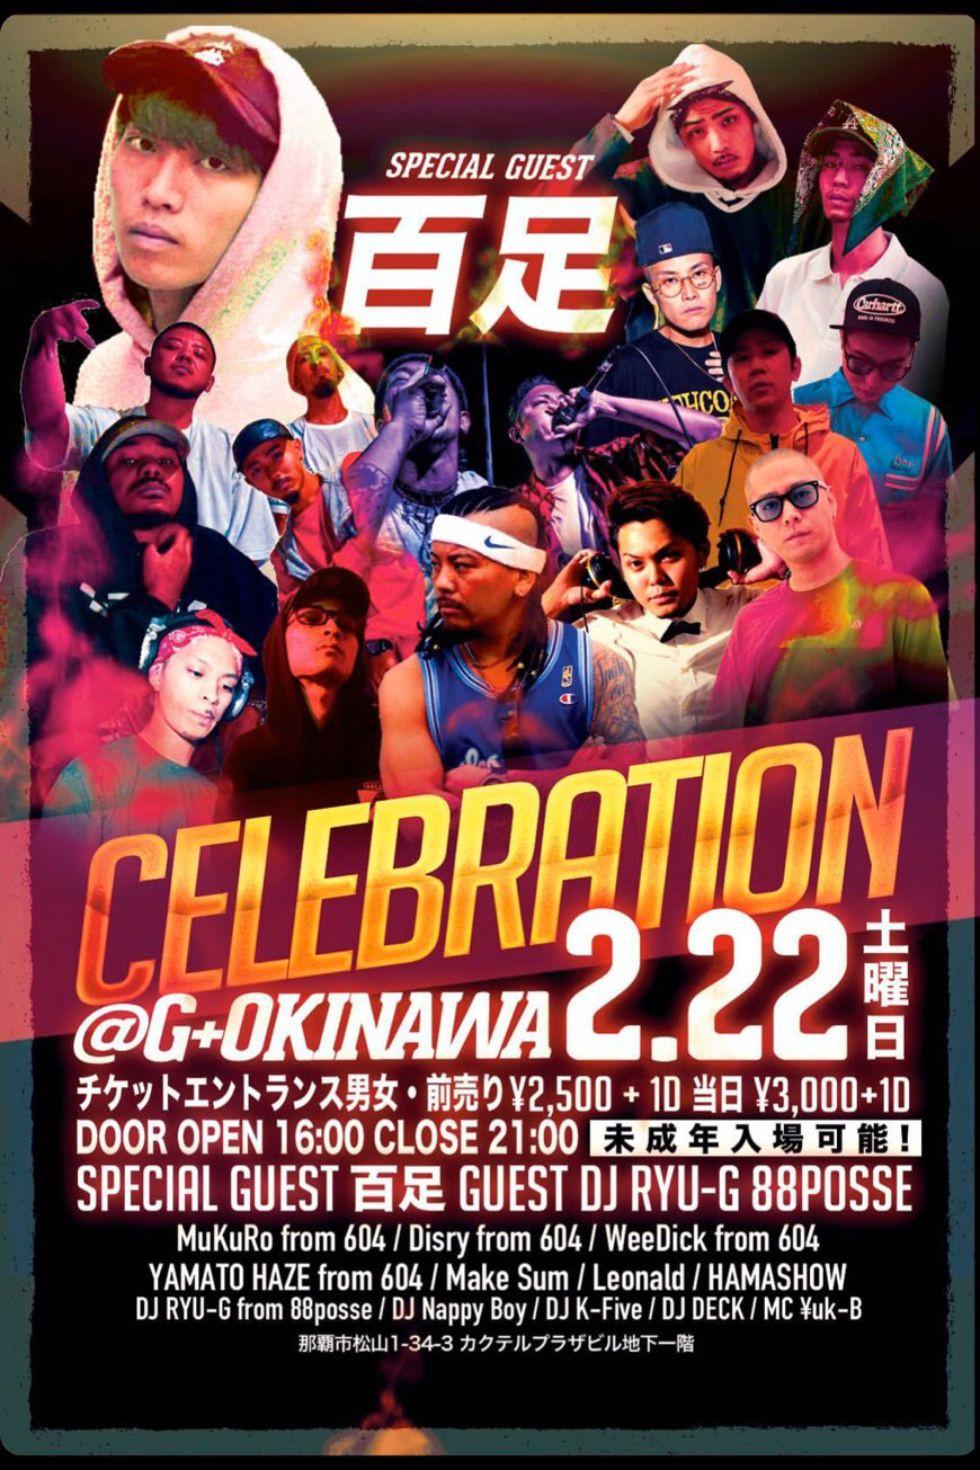 2020.02.22(SAT) CALEBRATION @G+OKINAWA